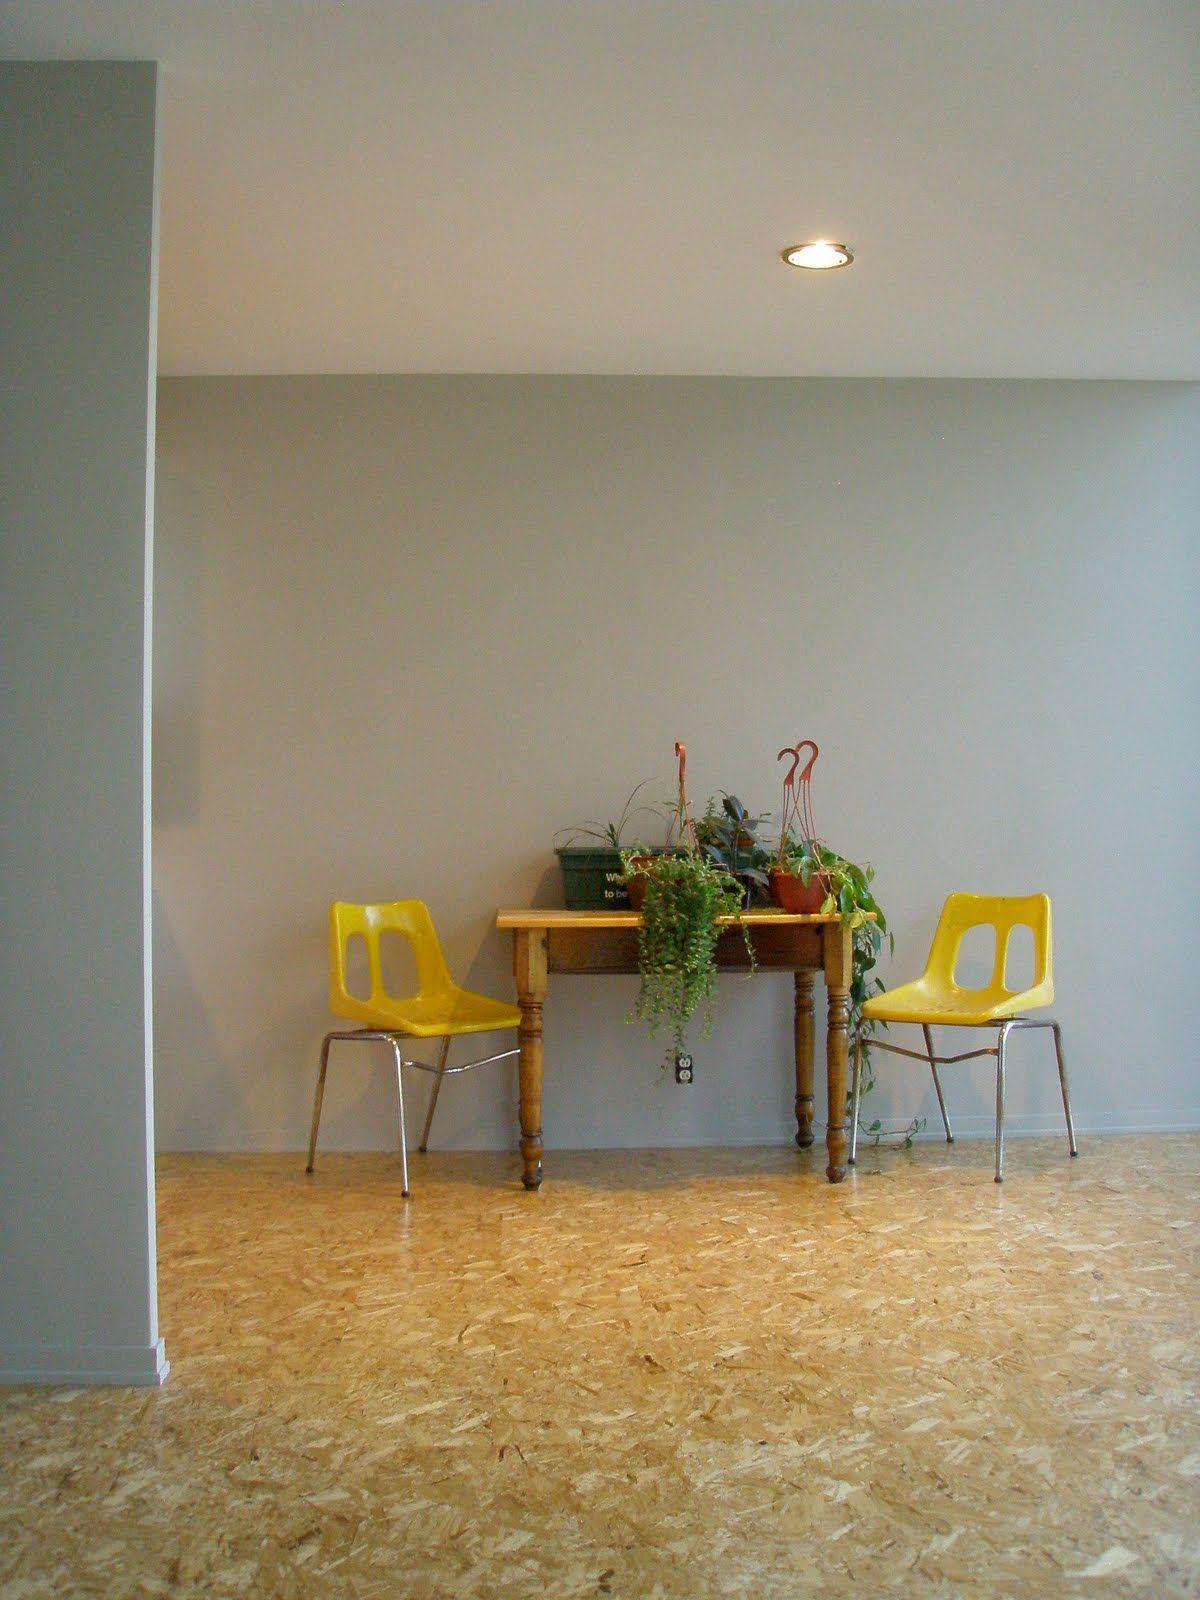 Osb Dans Salle De Bain finished osb floor | house flooring, chipboard interior, osb